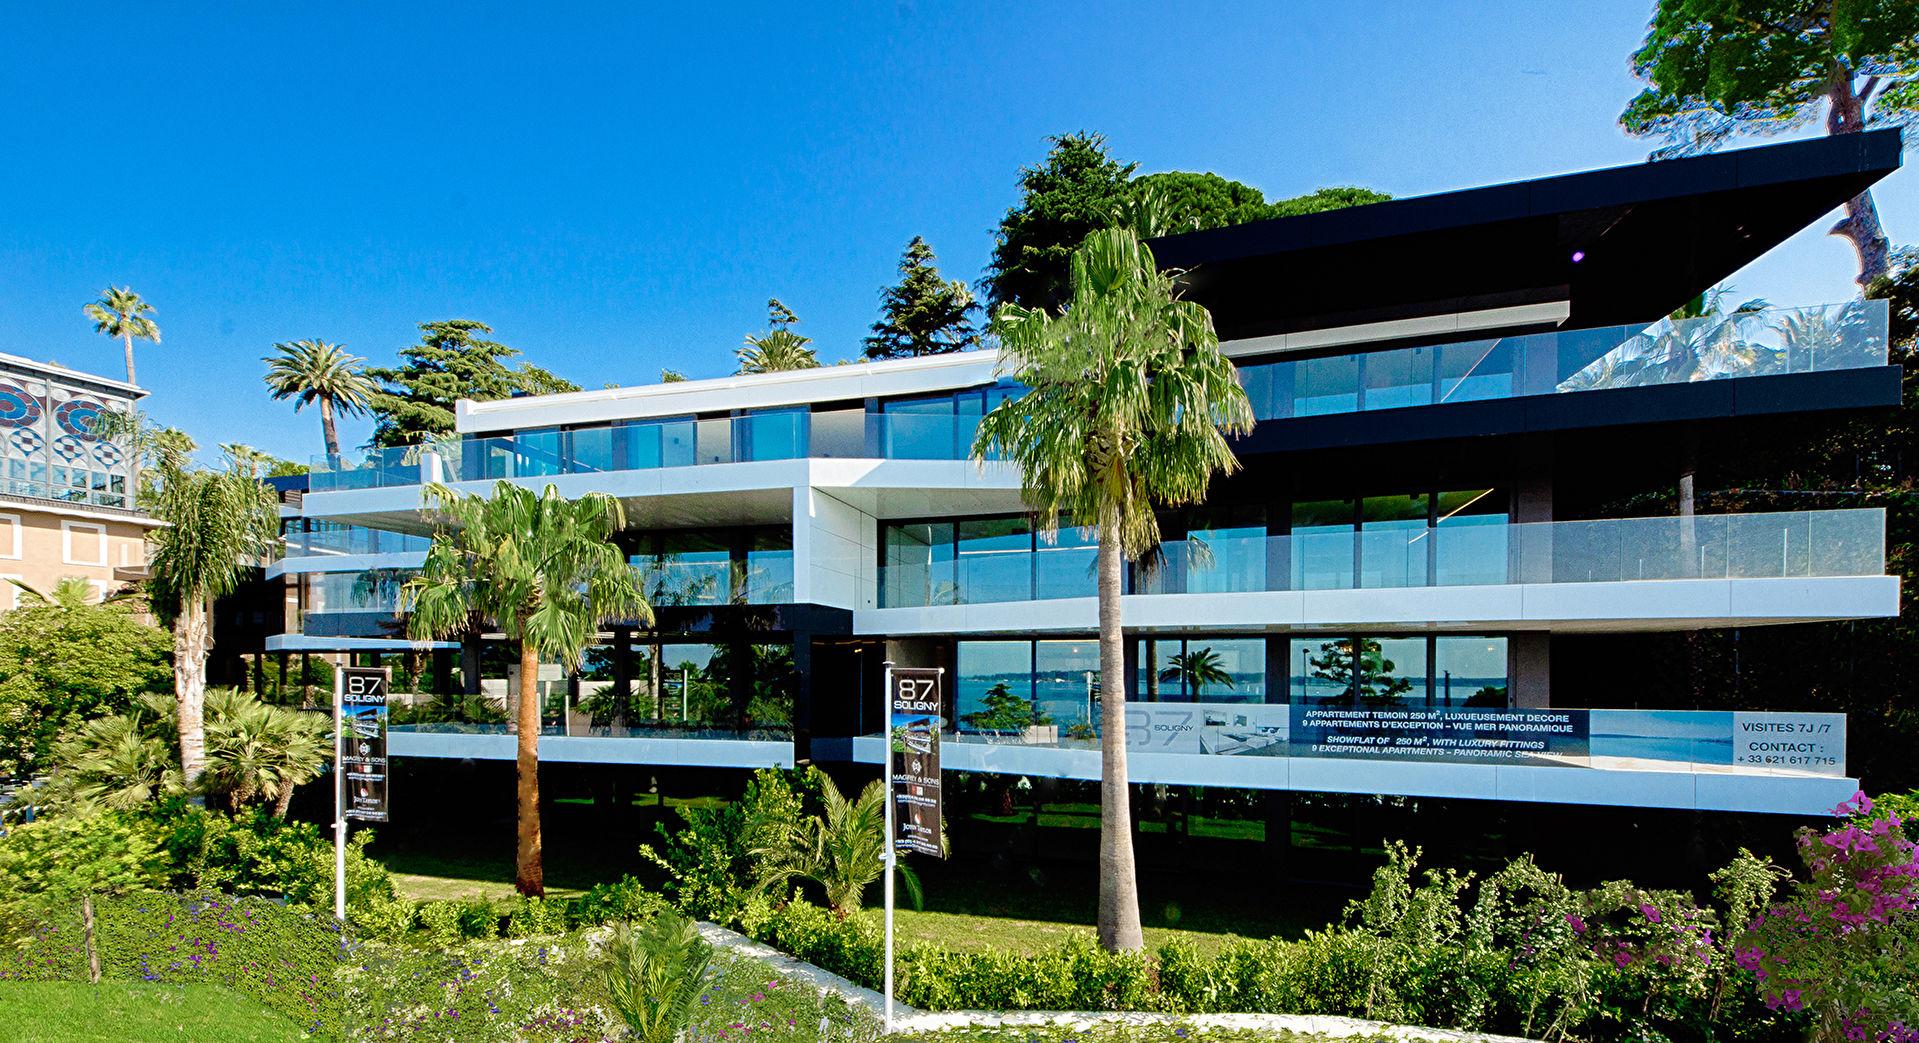 Apartamento por un Venta en Apartment Cannes, Provincia - Alpes - Costa Azul, 06400 Francia